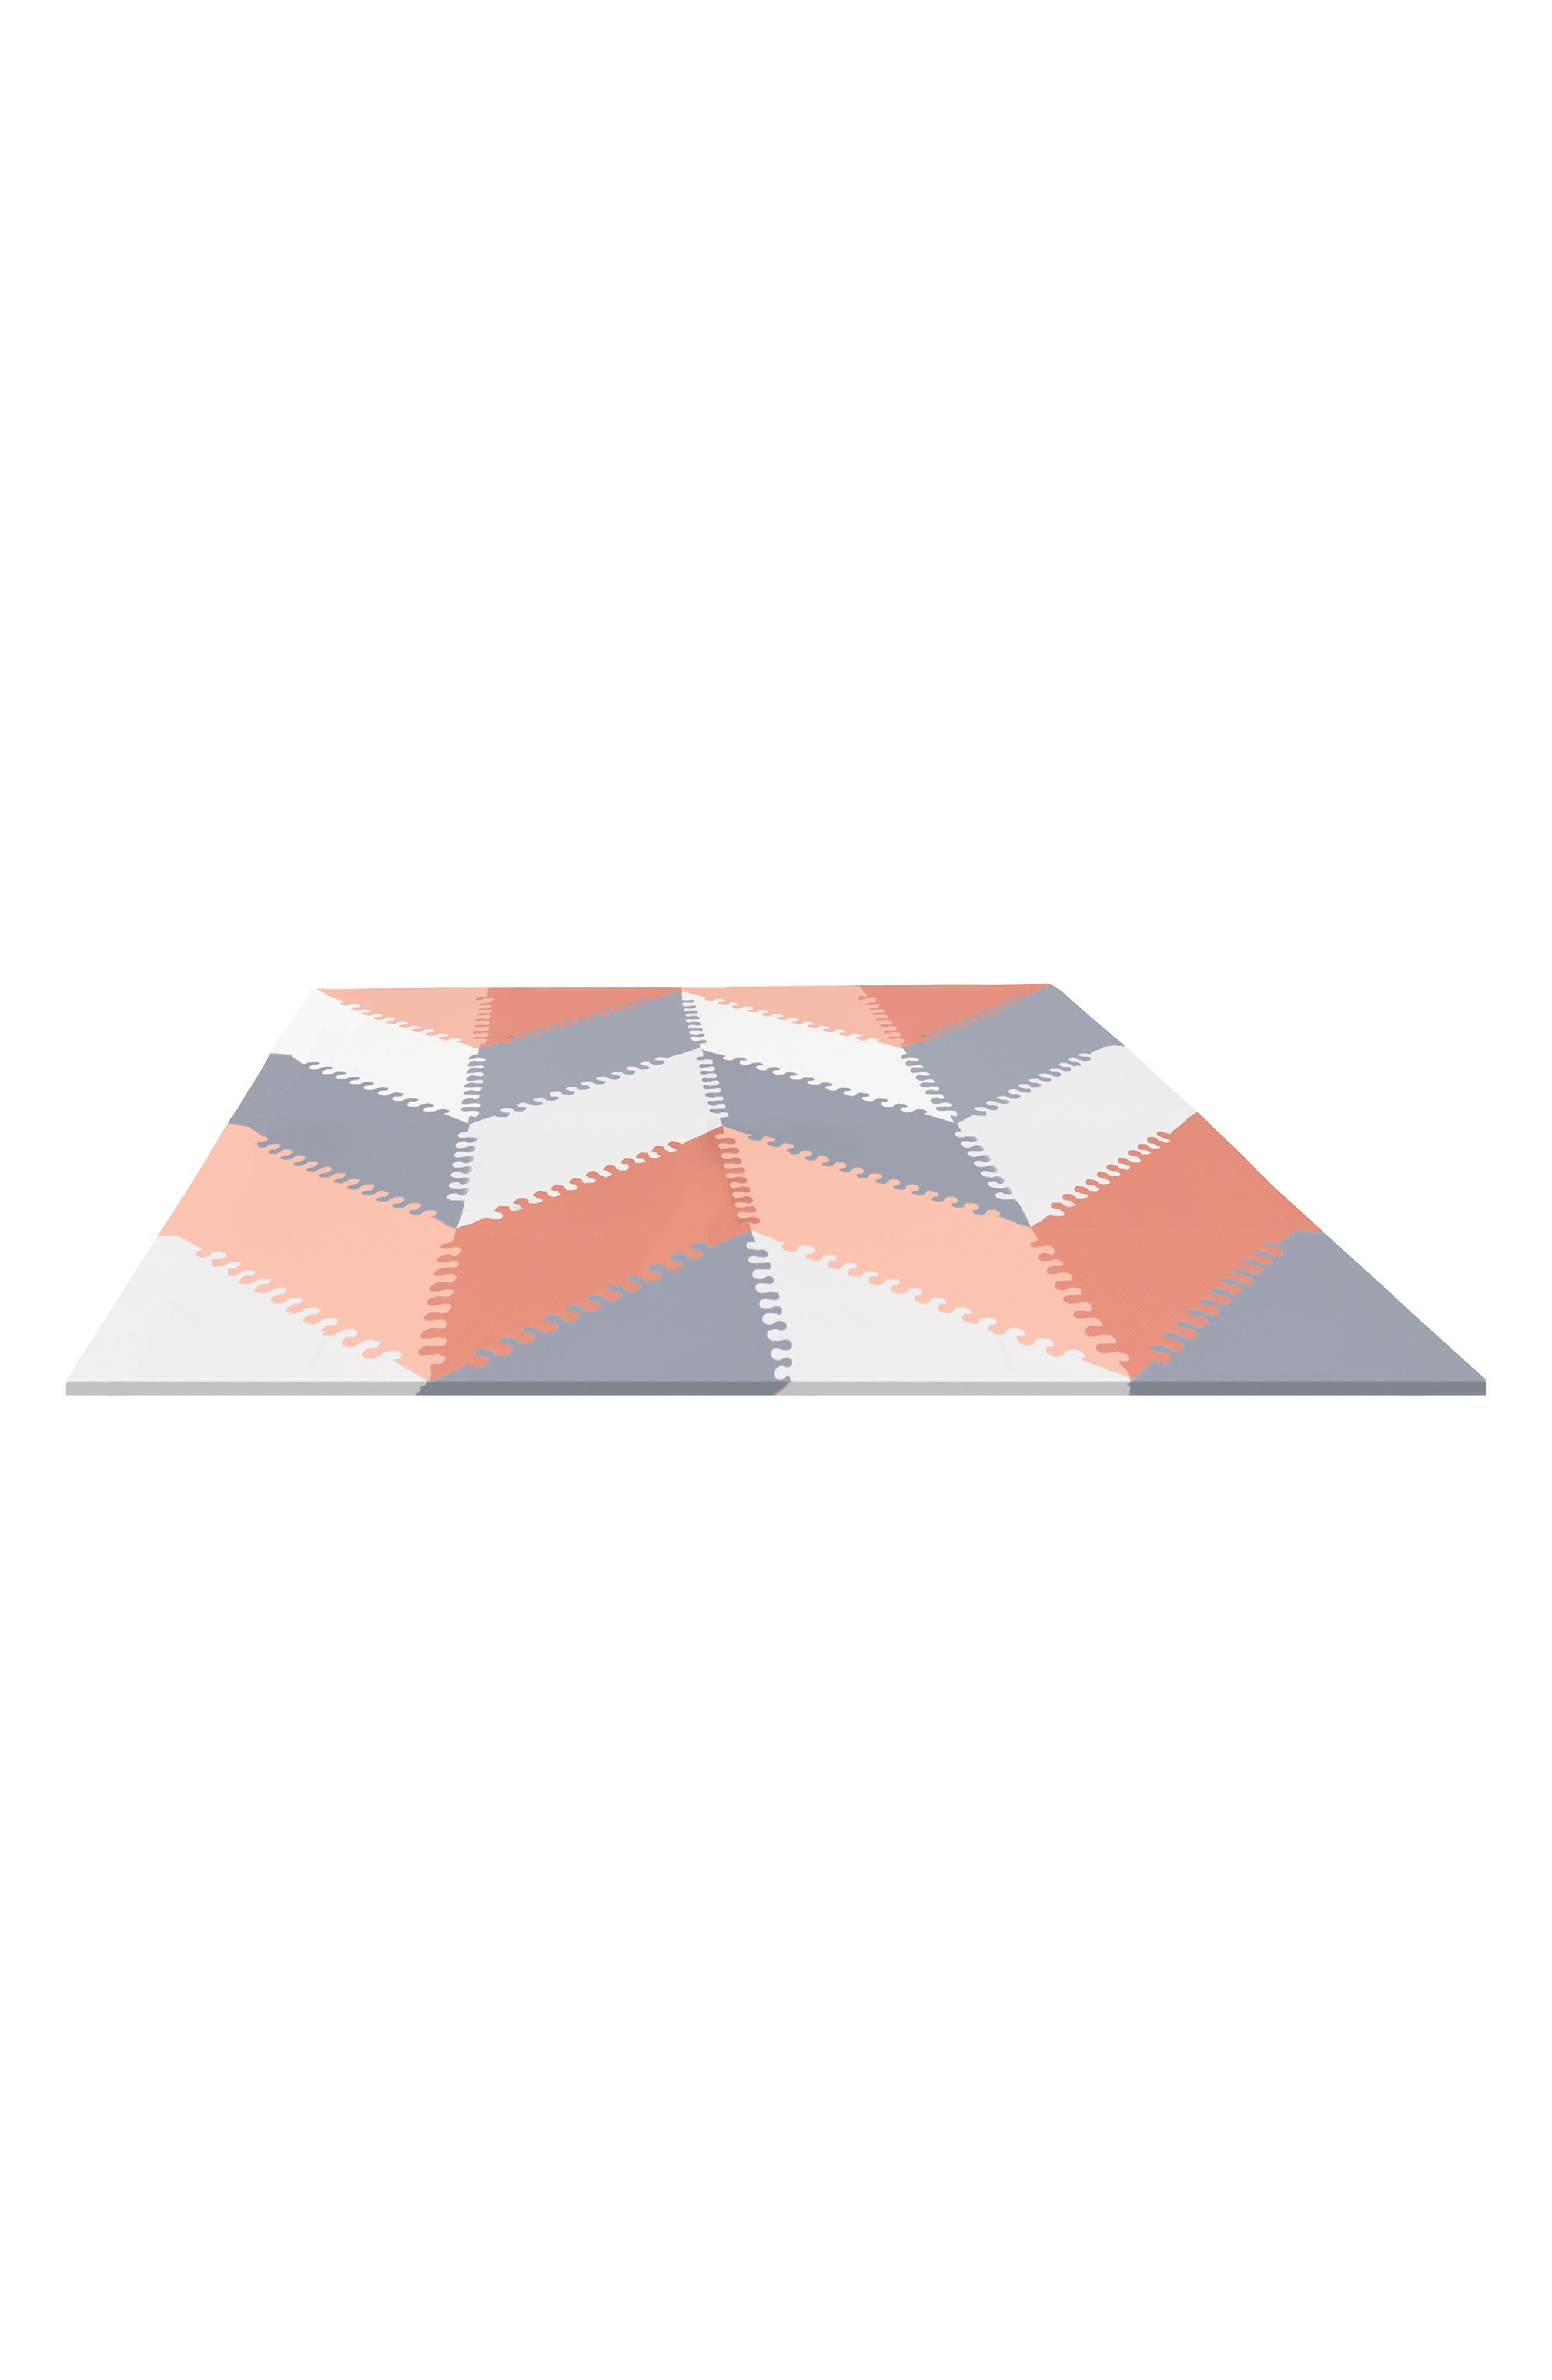 Skip Hop Playspot Floor Tiles Size One Size  Grey